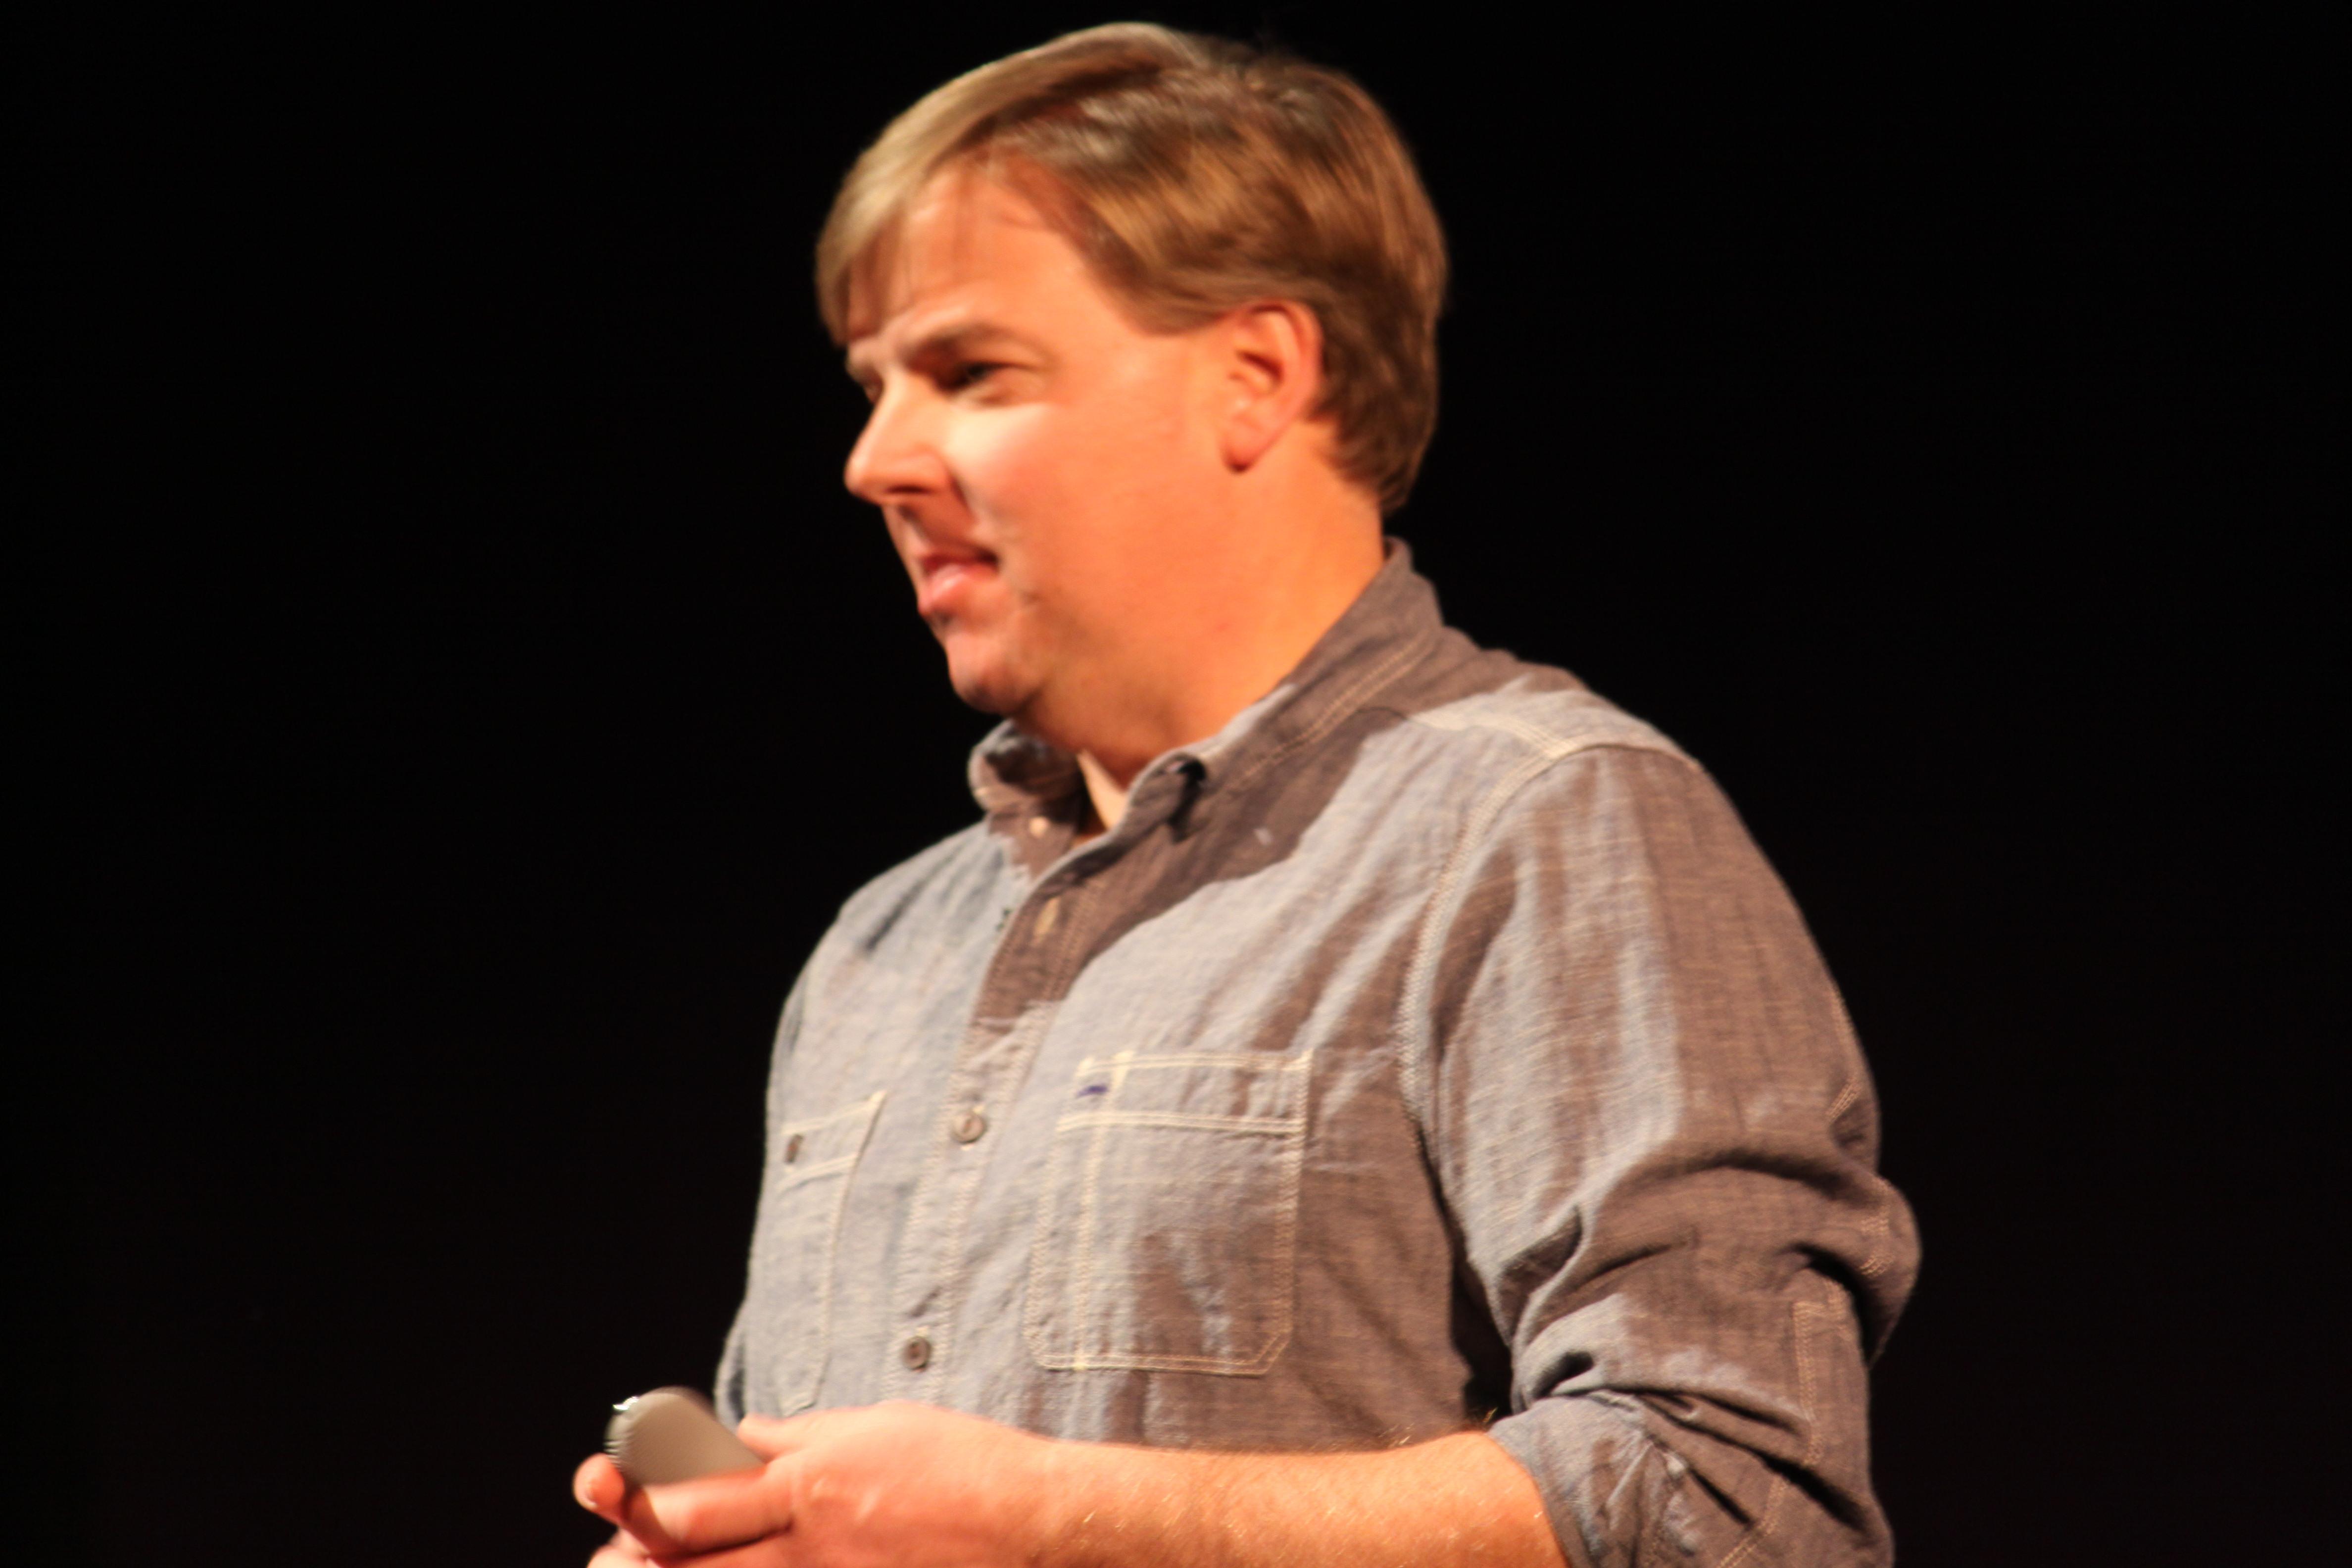 Chip Dayton speaking to students